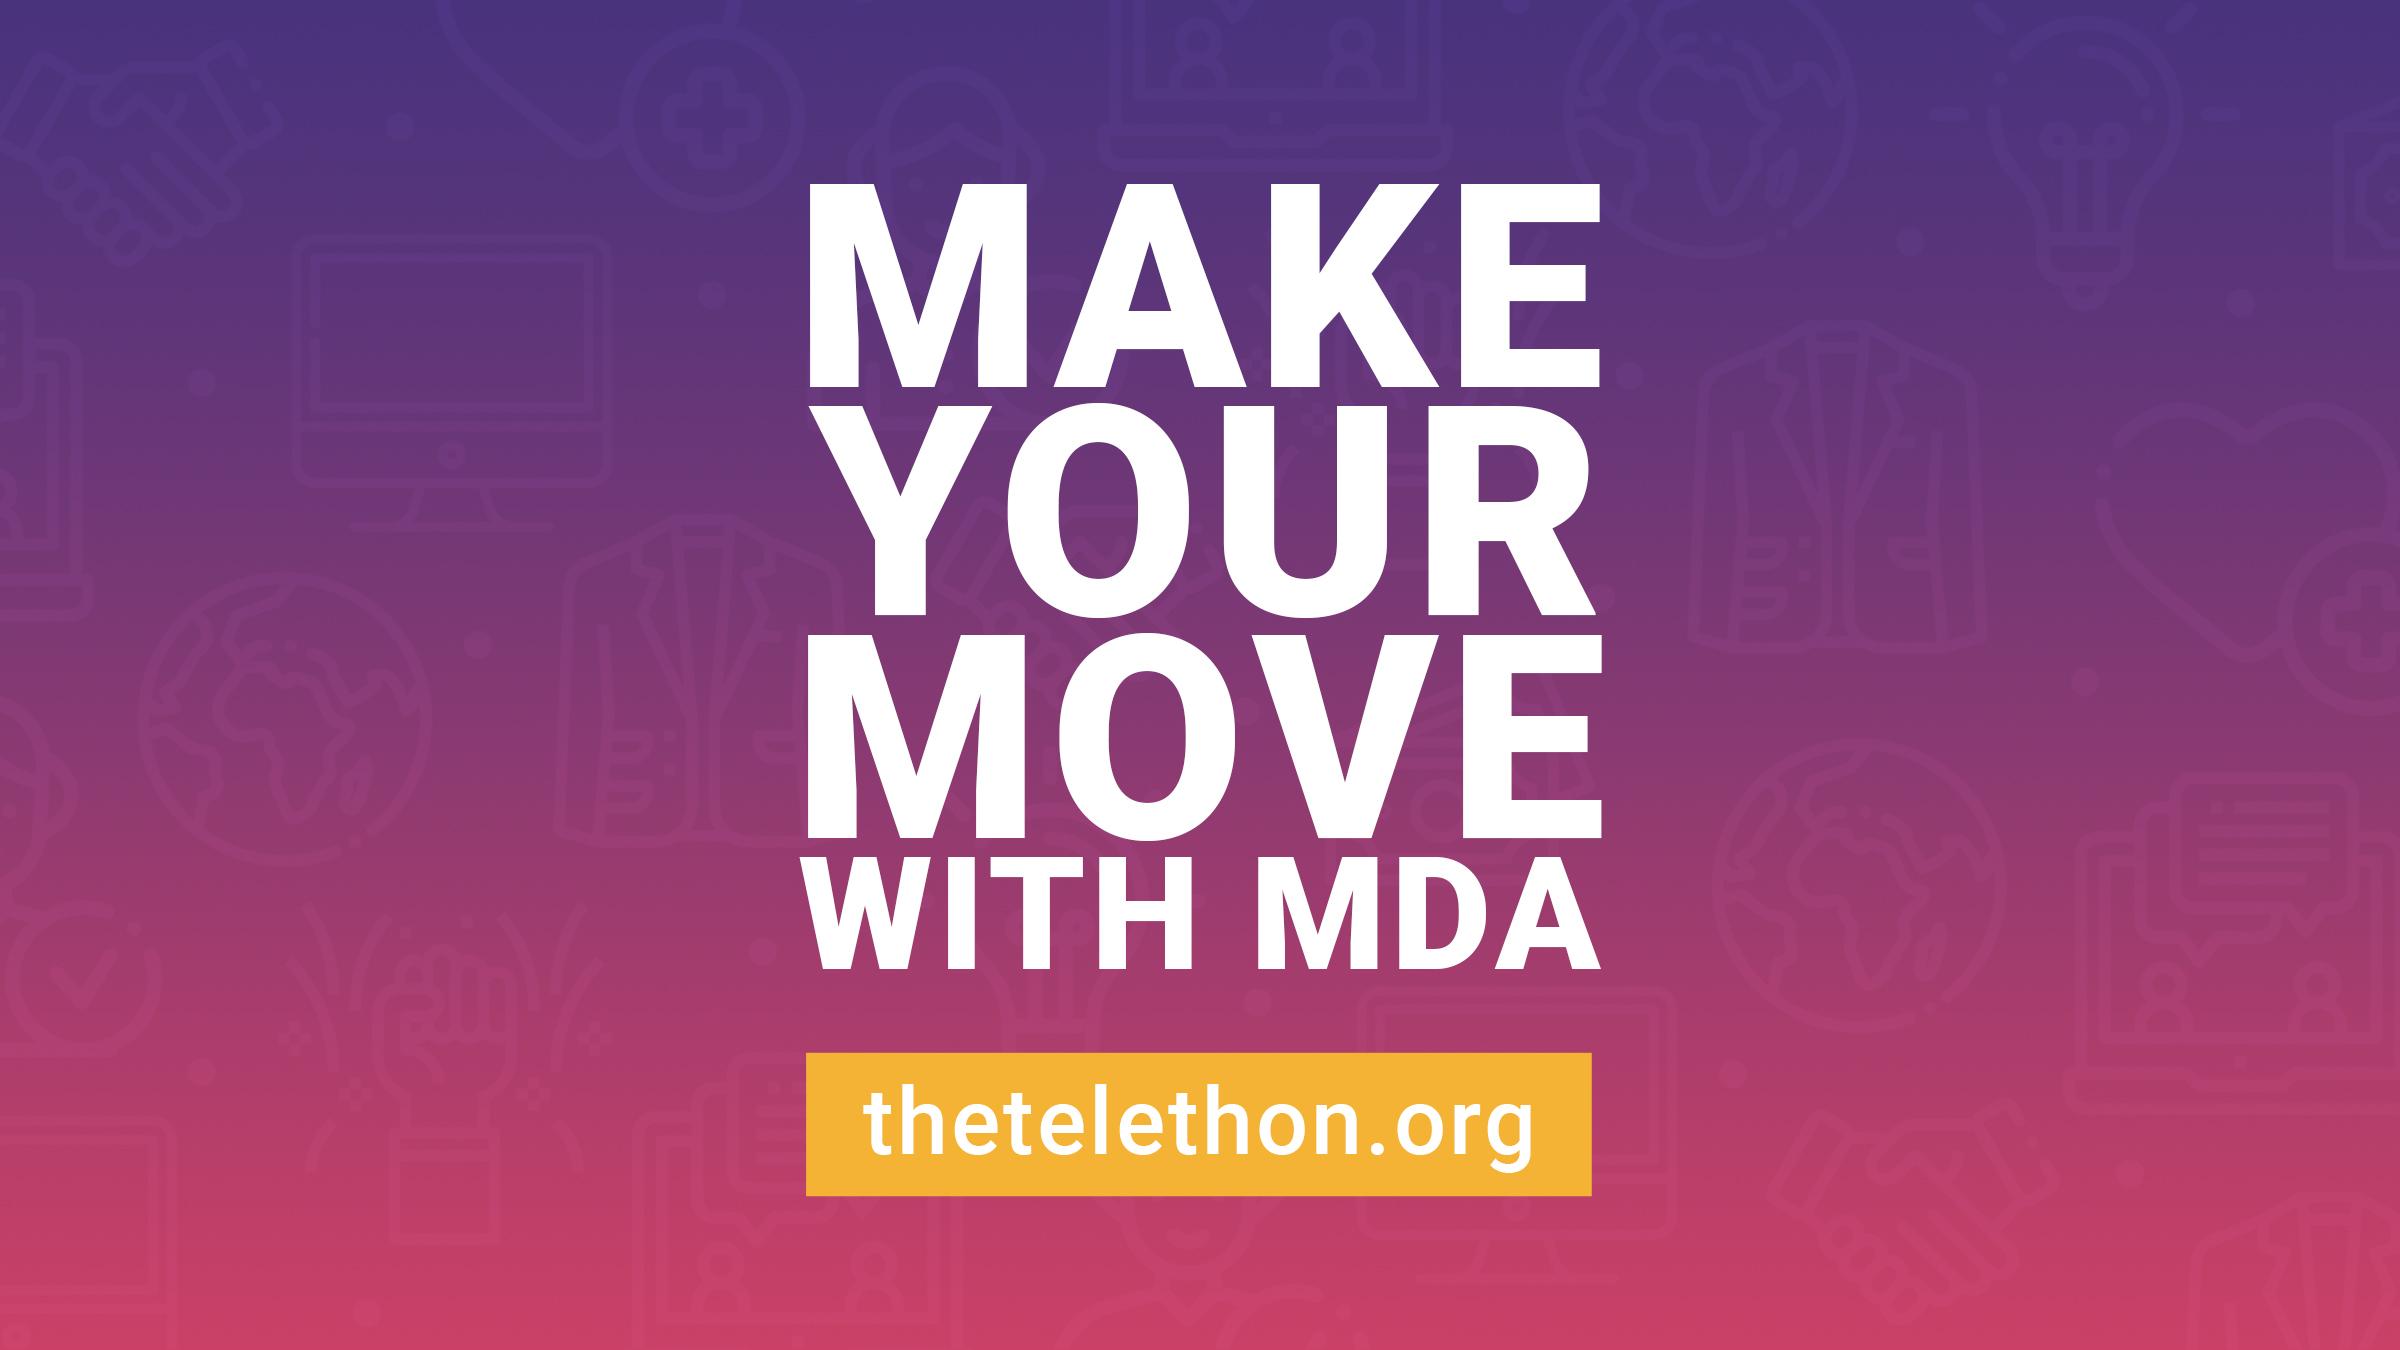 Deca Mda Telethon 2020 Twitter 4